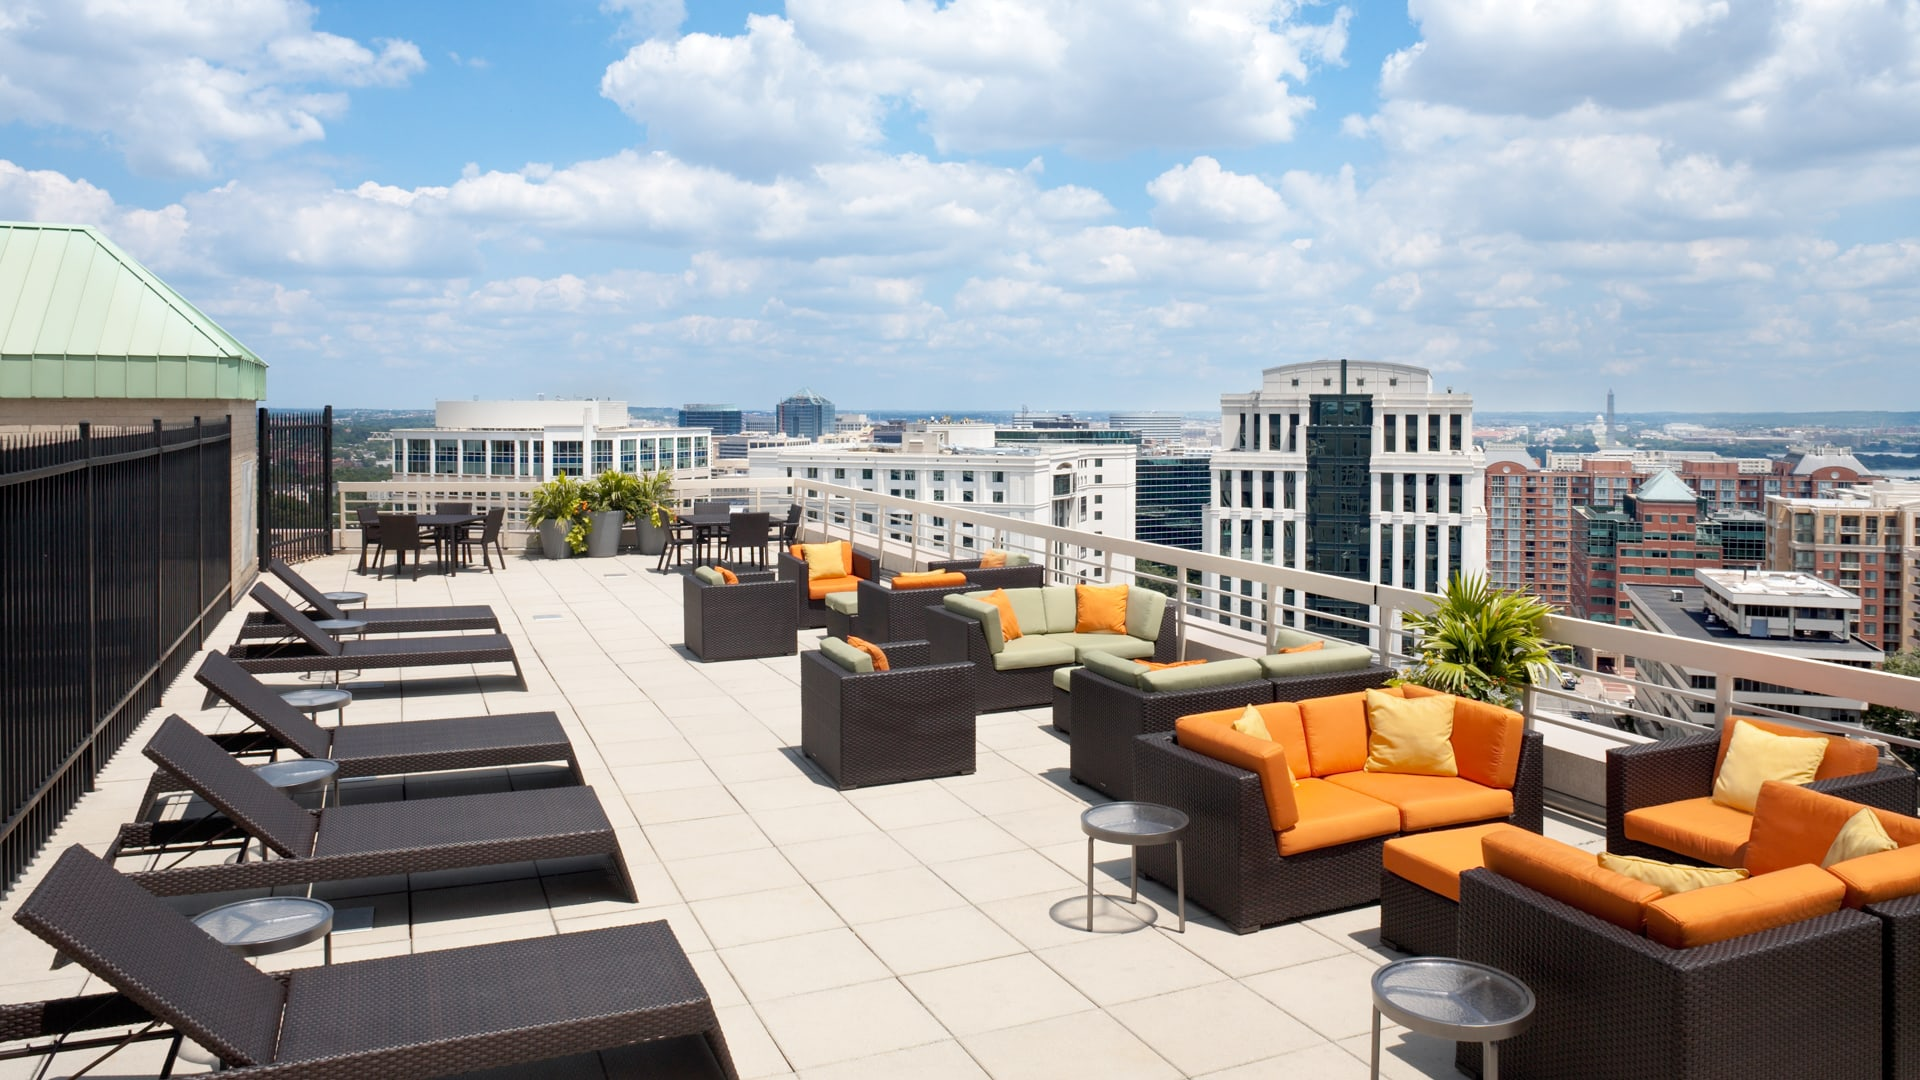 Courthouse Plaza Apartments - Sun Deck